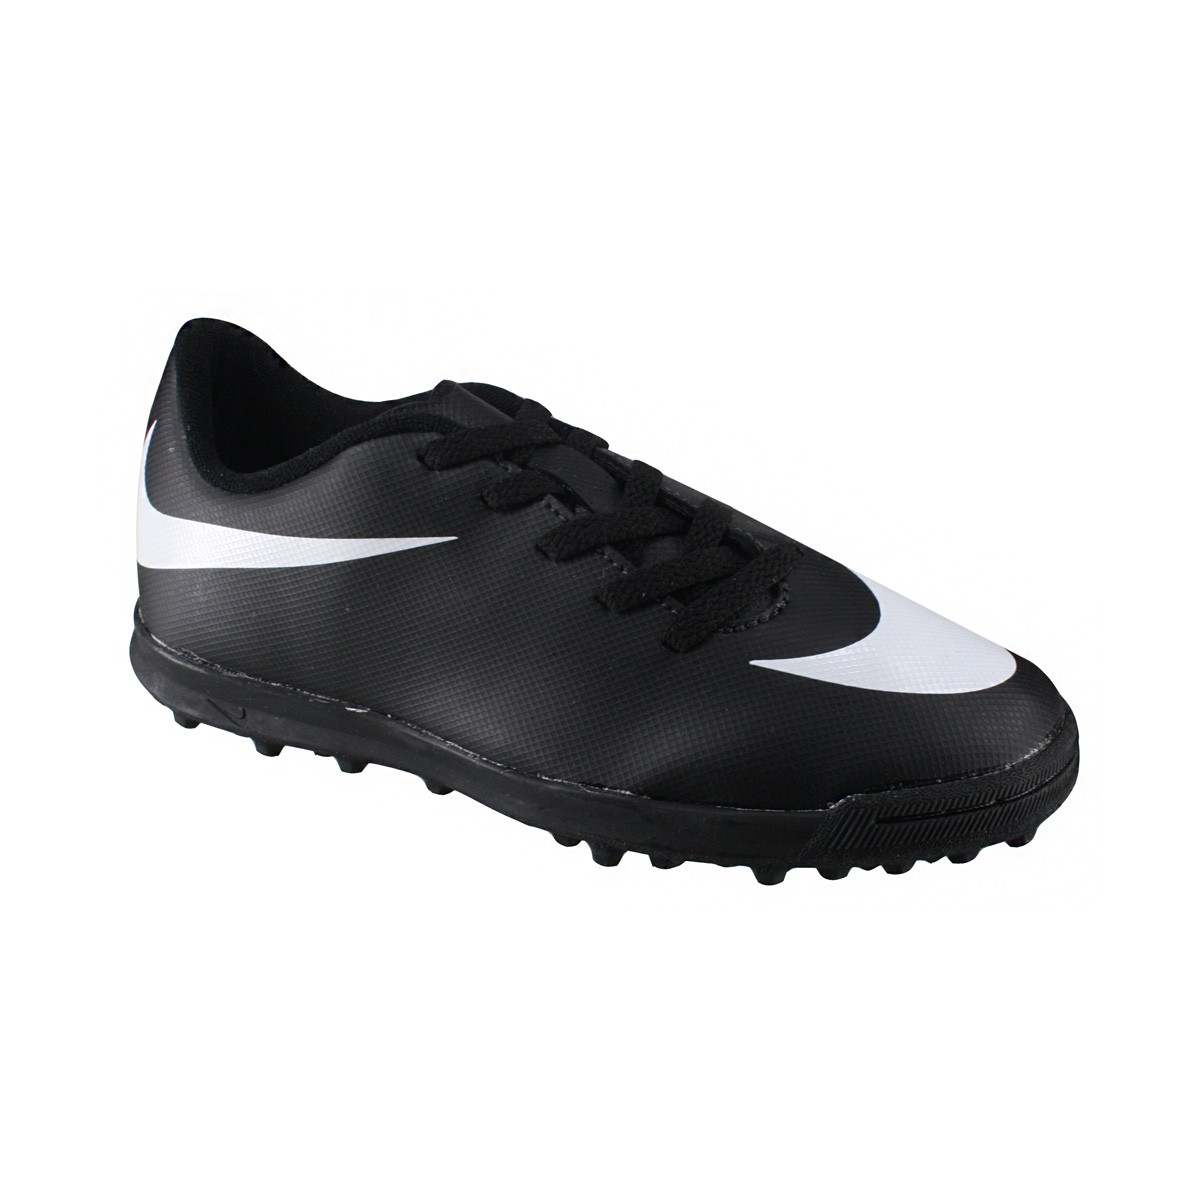 Chuteira Society Infantil Nike JR Bravata TF 768921-011 Preto Branco bb0699b8edba7